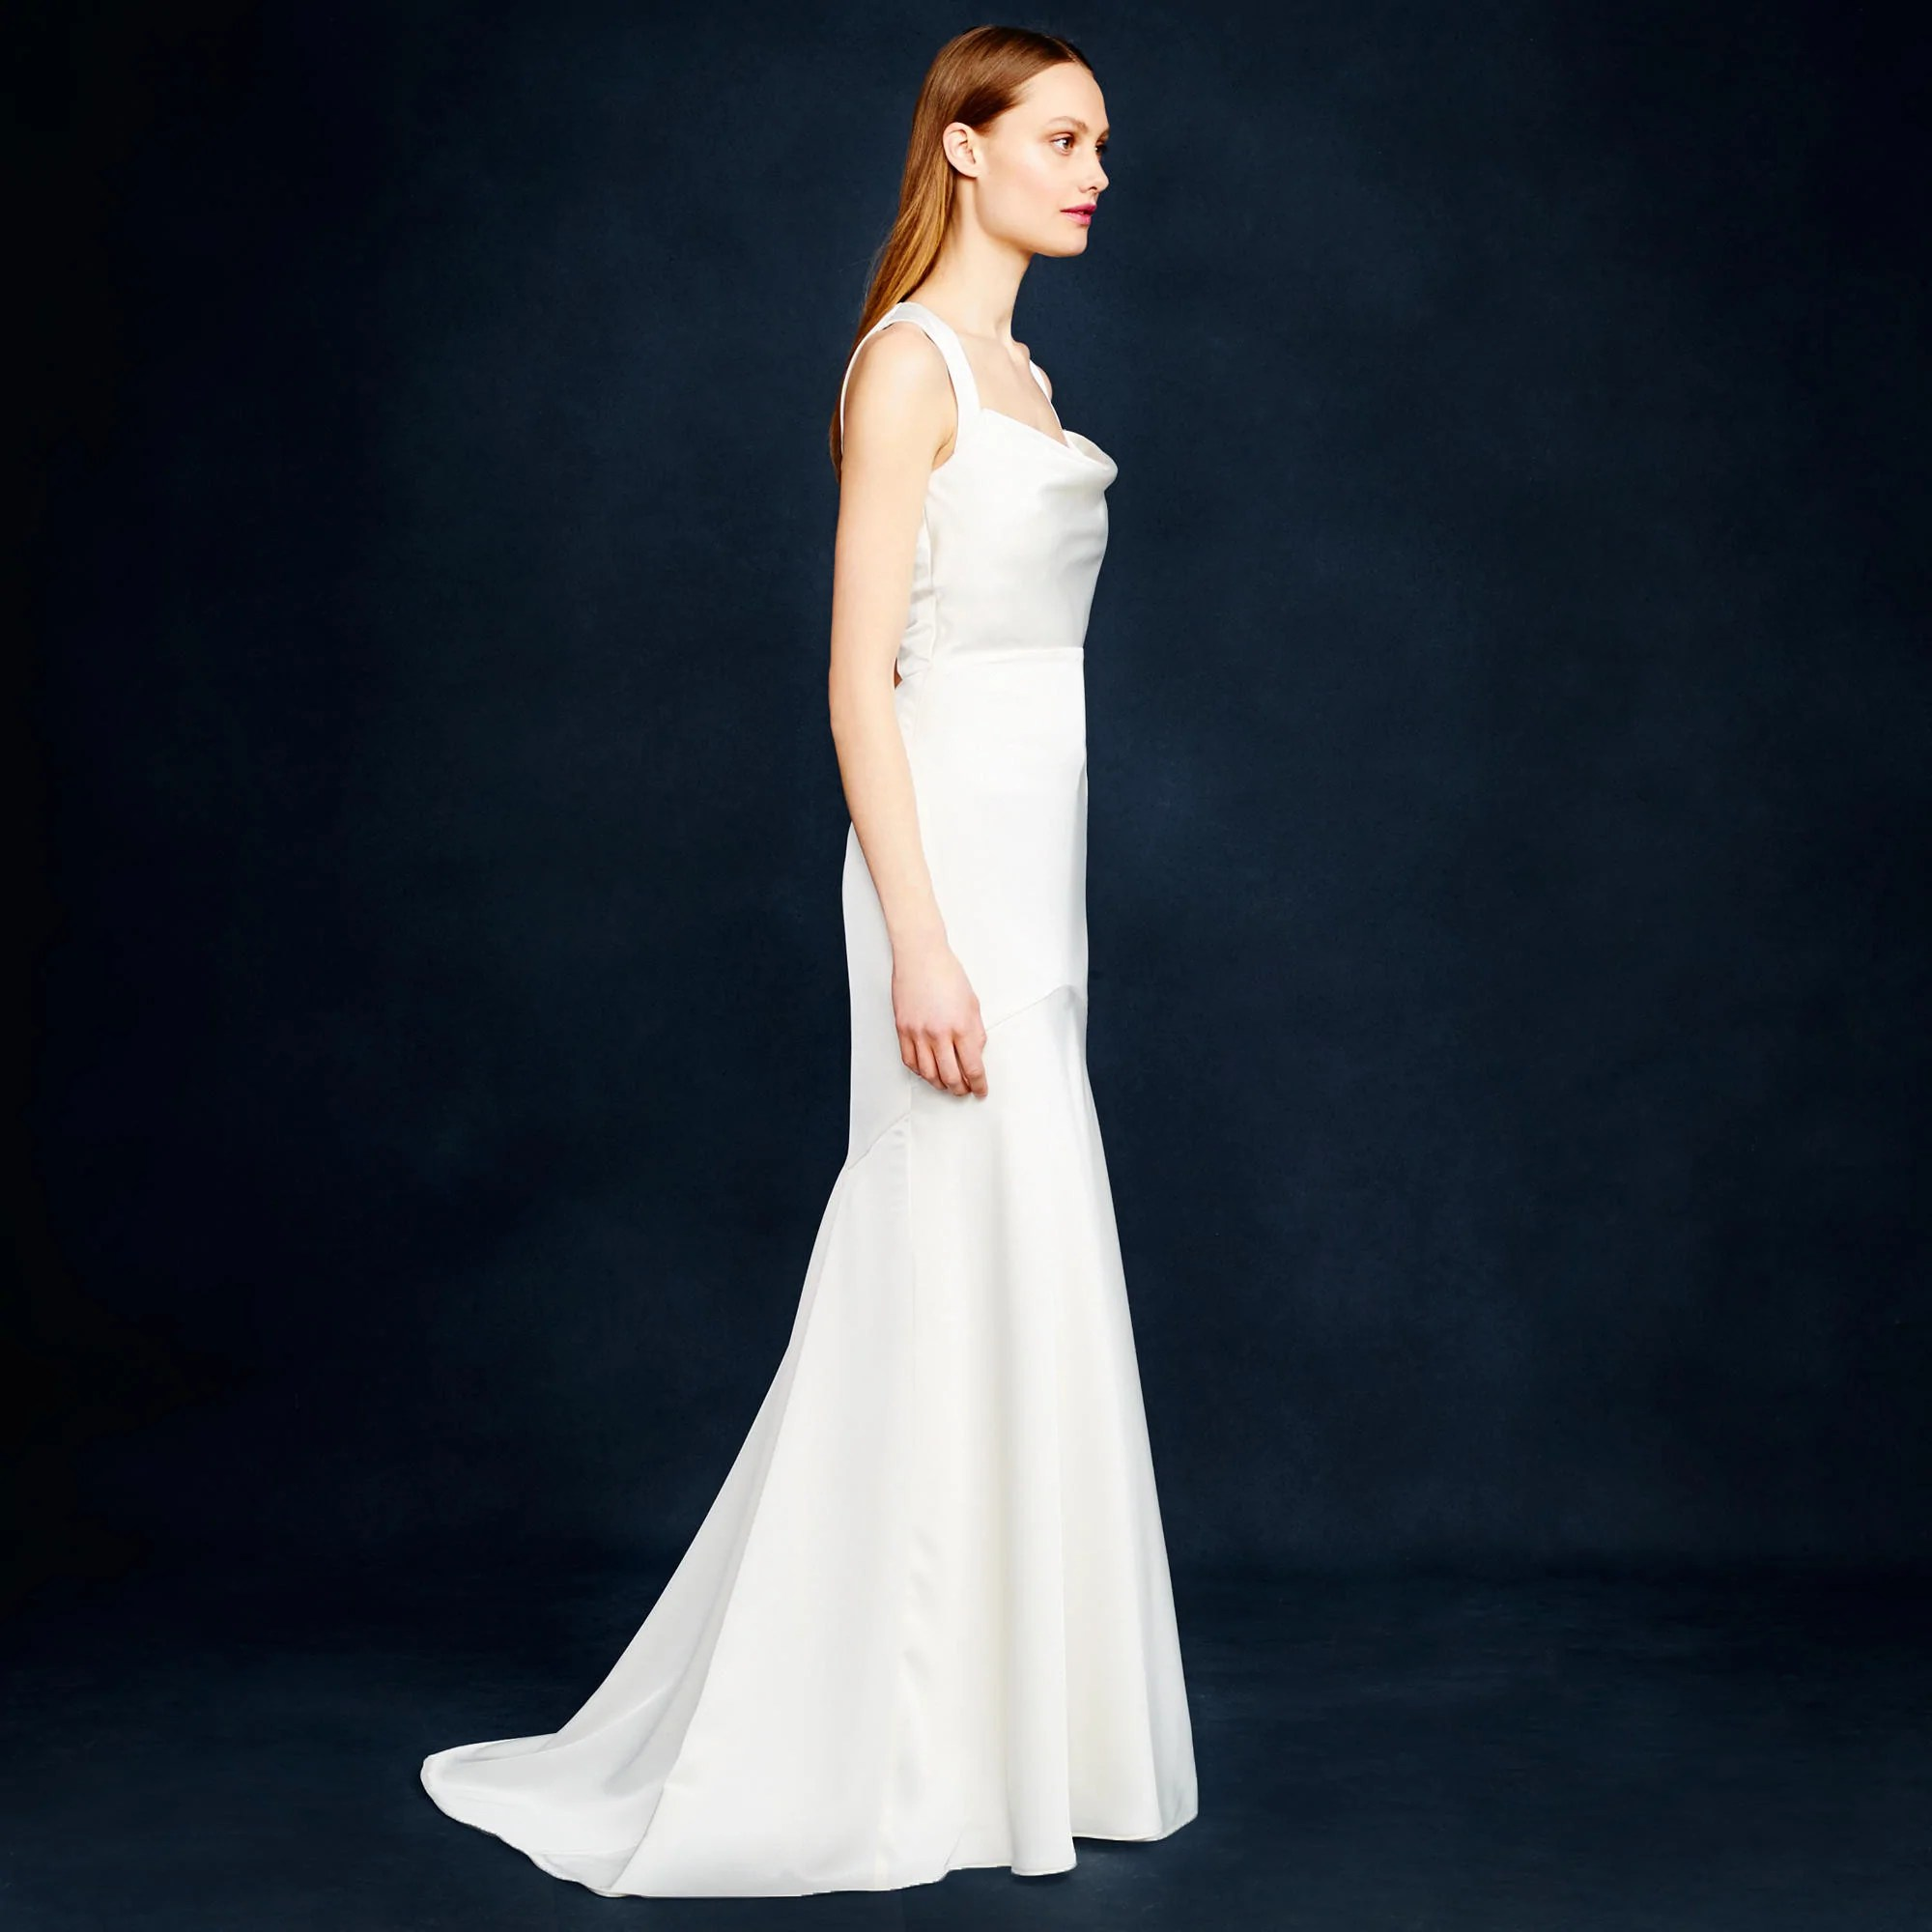 j crew jillian wedding gown j crew wedding dress J Crew Jillian Wedding Gown